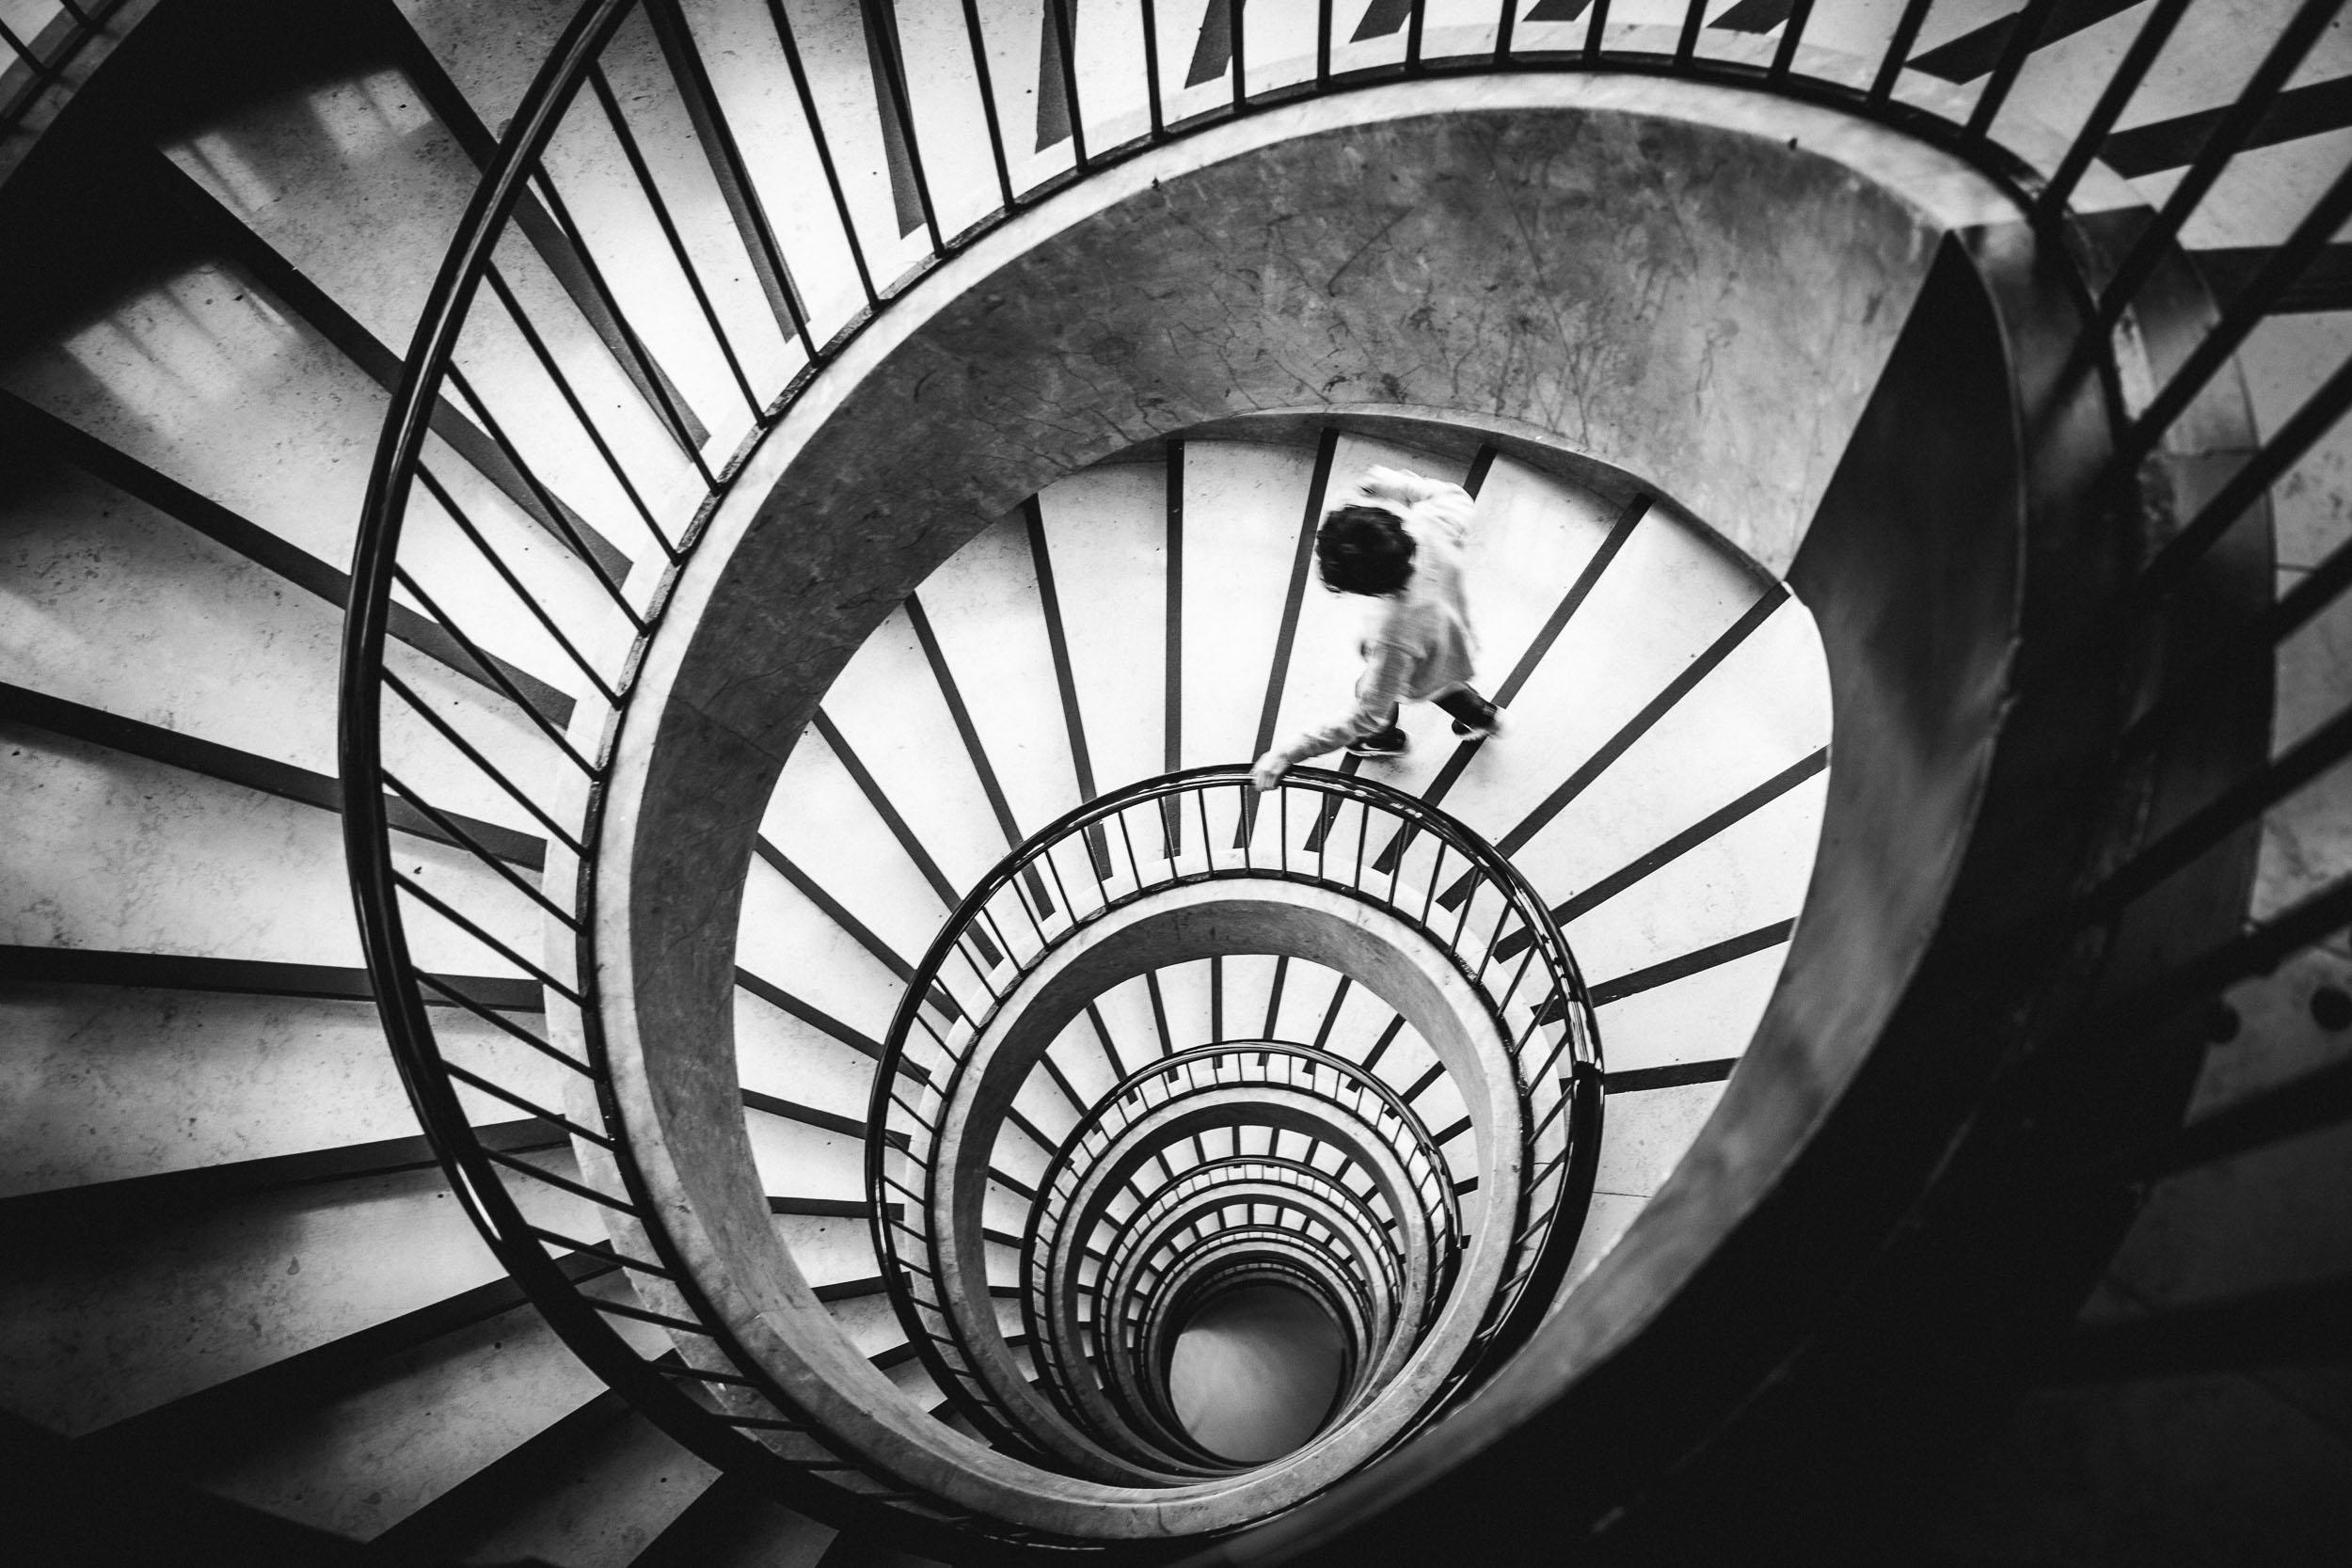 Boy running down spiral staircase by Merja Varkemaa